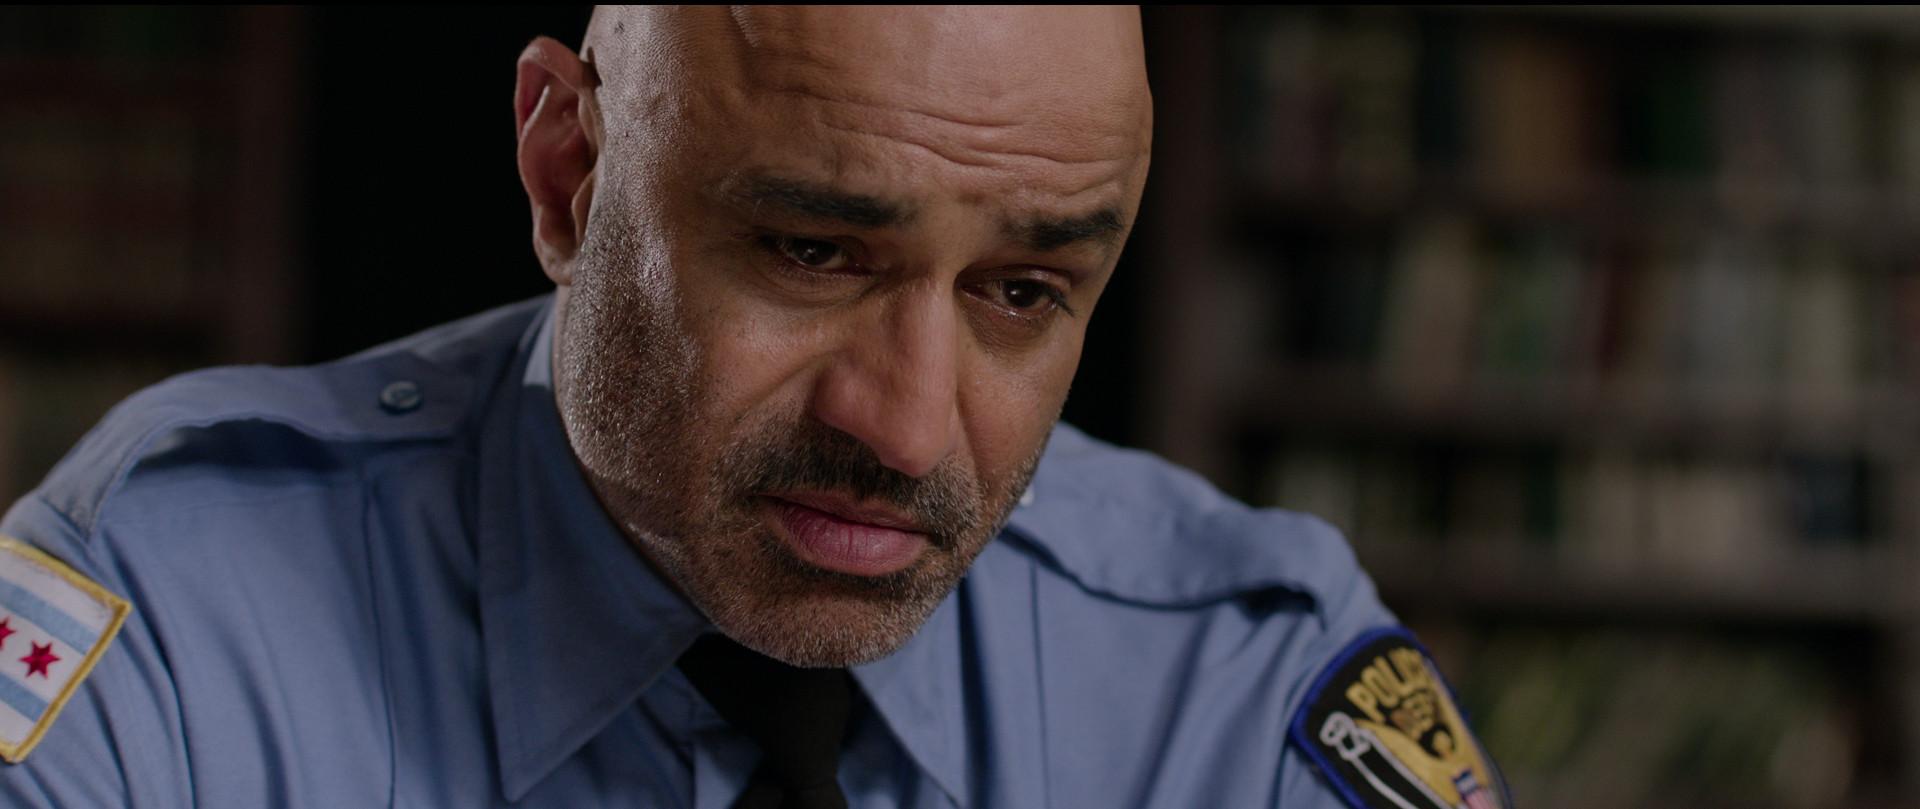 Faran Tahir as Majeed. The inner conflict.